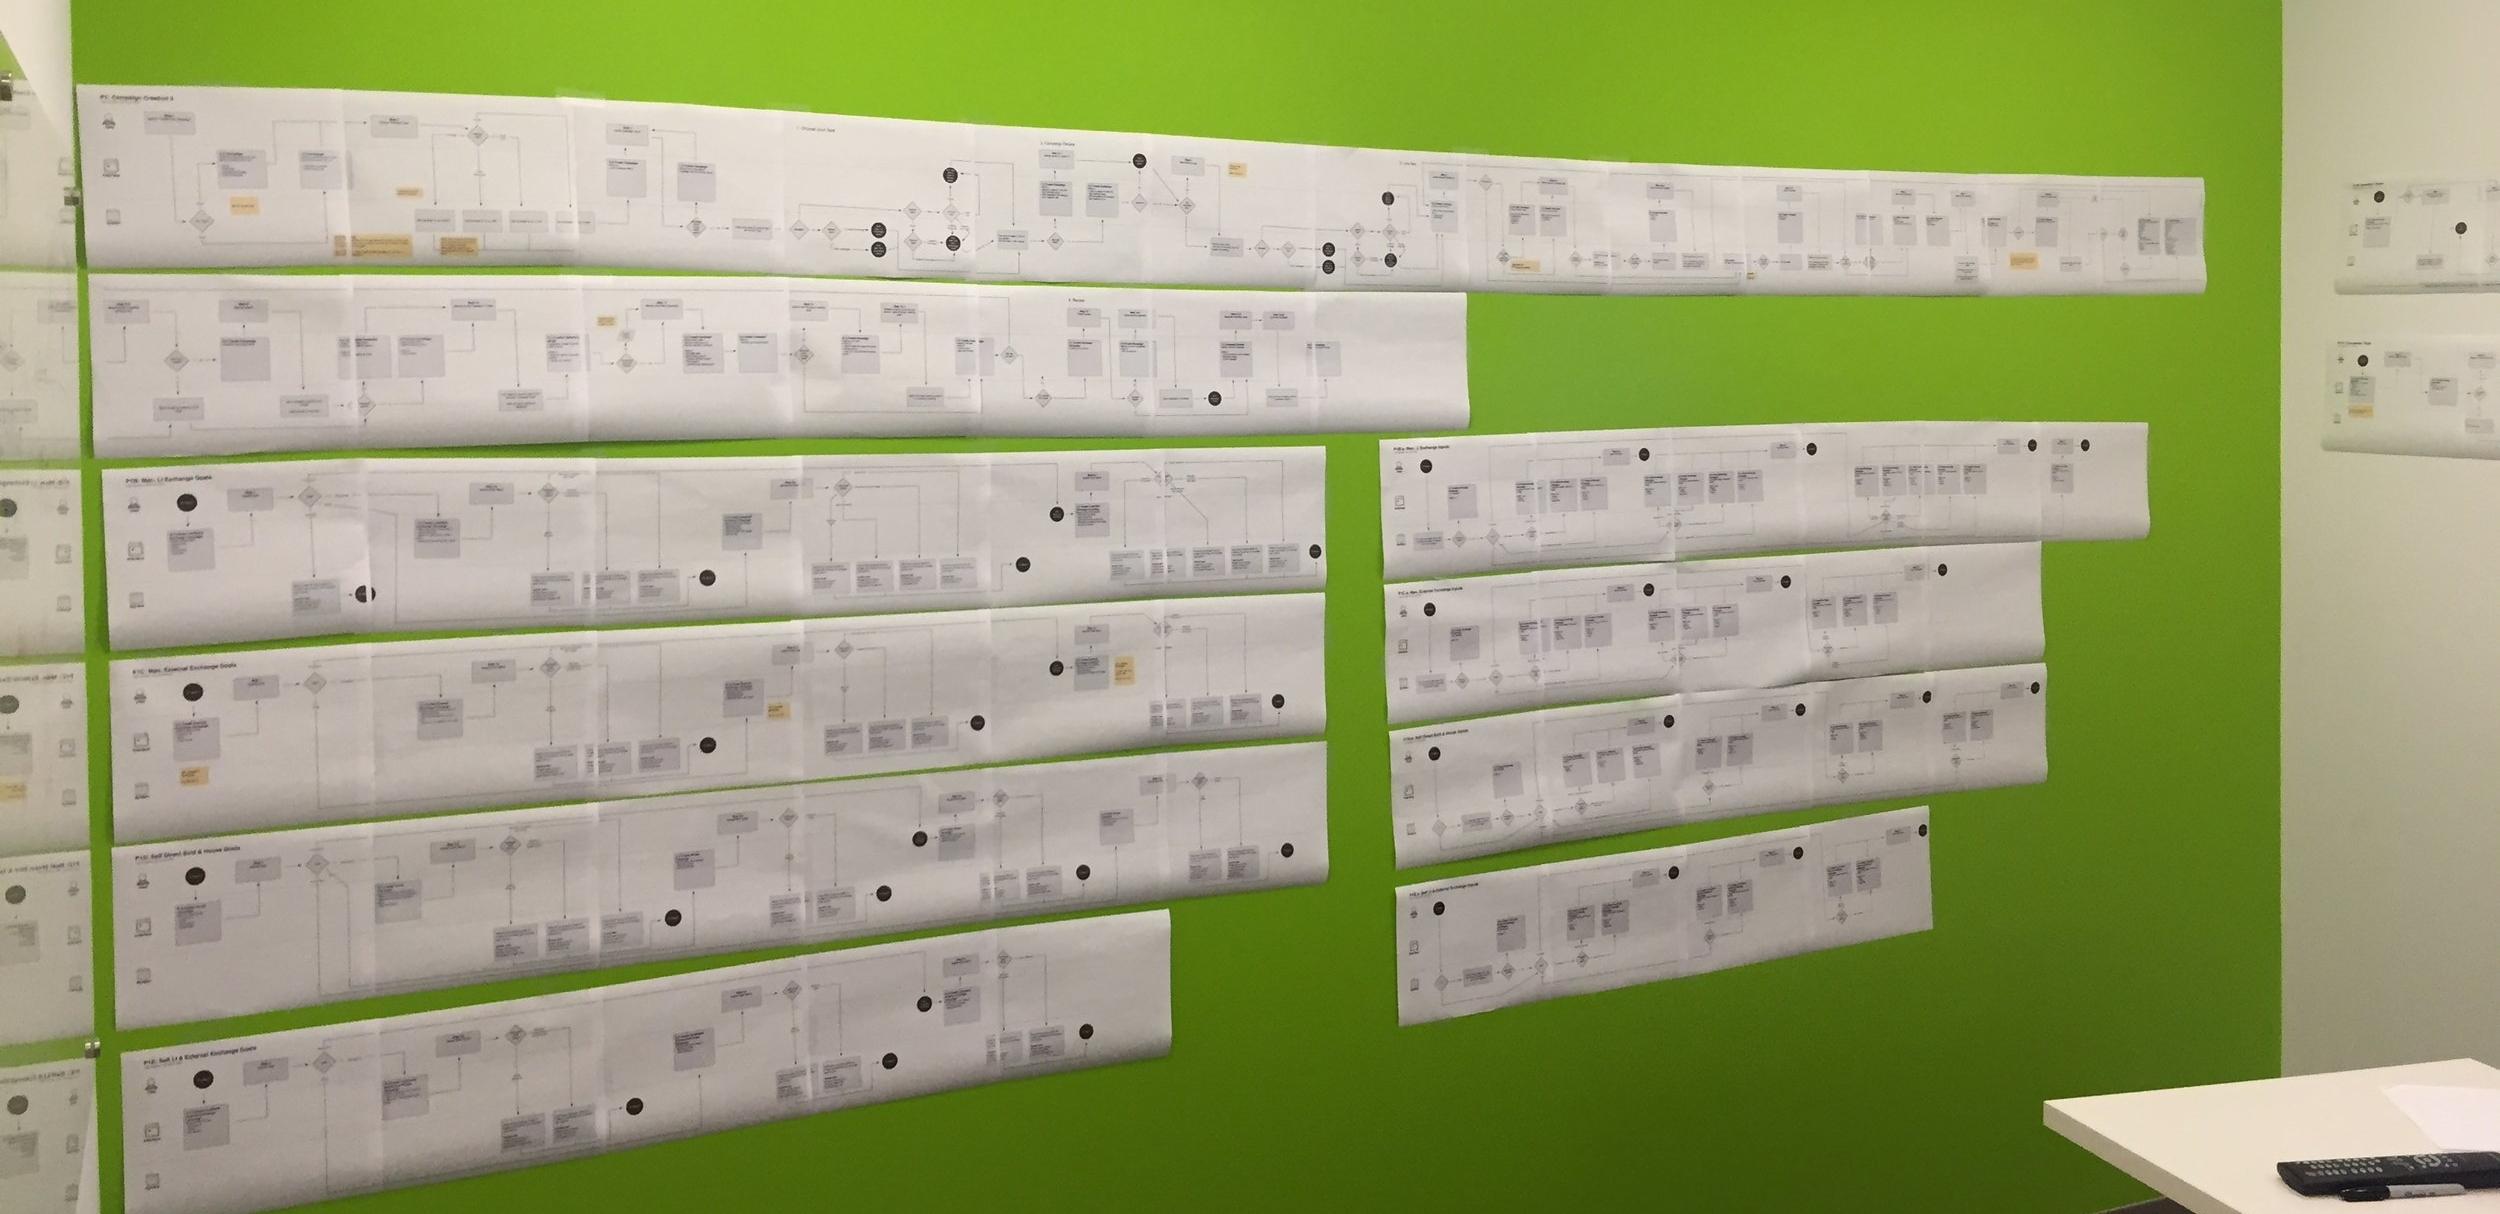 Process-Flows-Wall.JPG